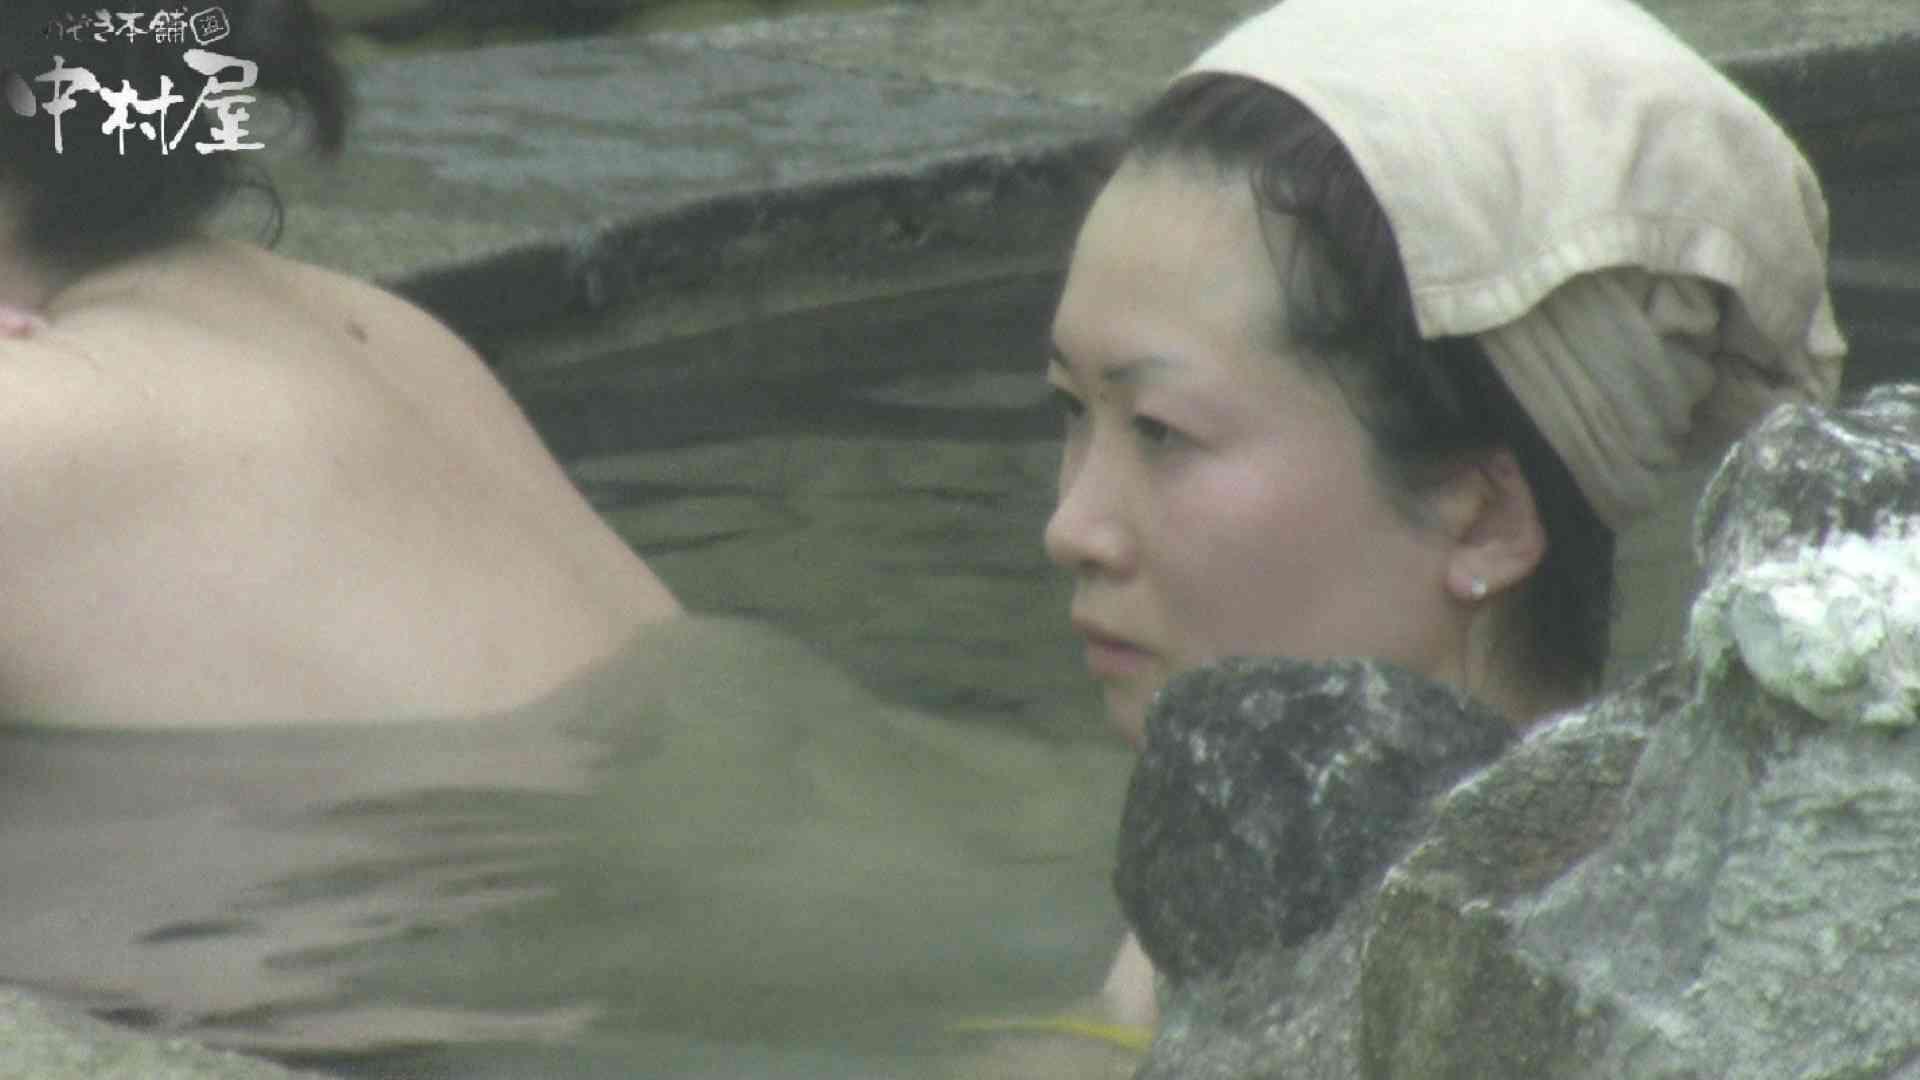 Aquaな露天風呂Vol.906 露天風呂編  86PIX 74